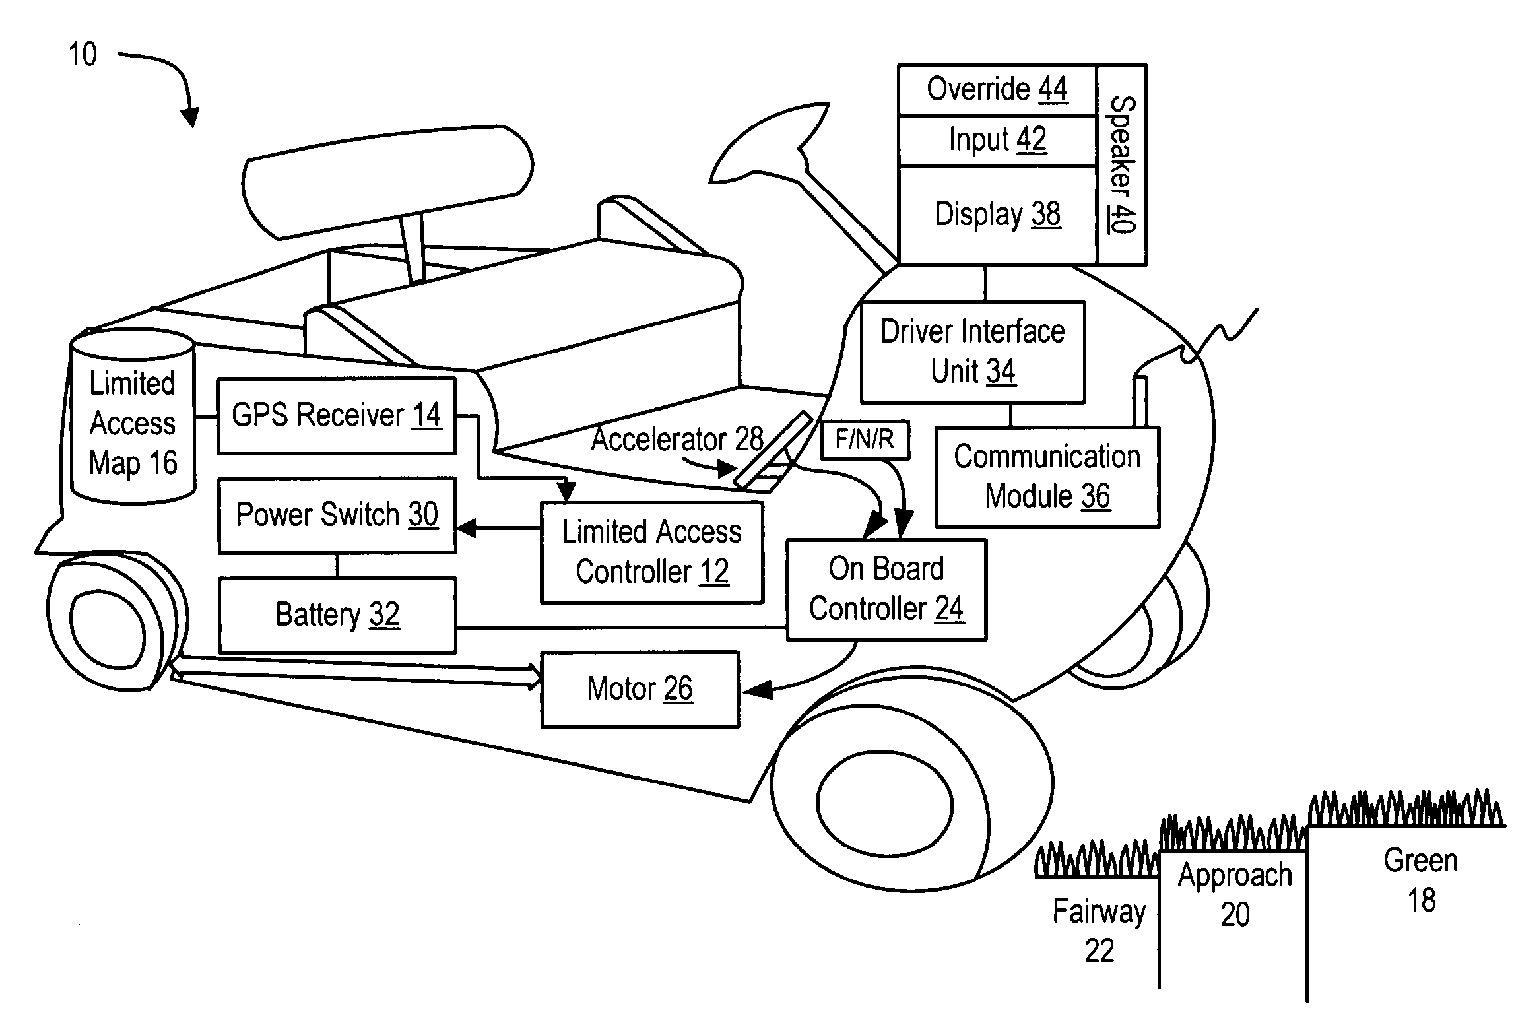 ezgo marathon gas wiring diagram 1989 sportster 1200 uplink granted golf cart control patent ensuring carts